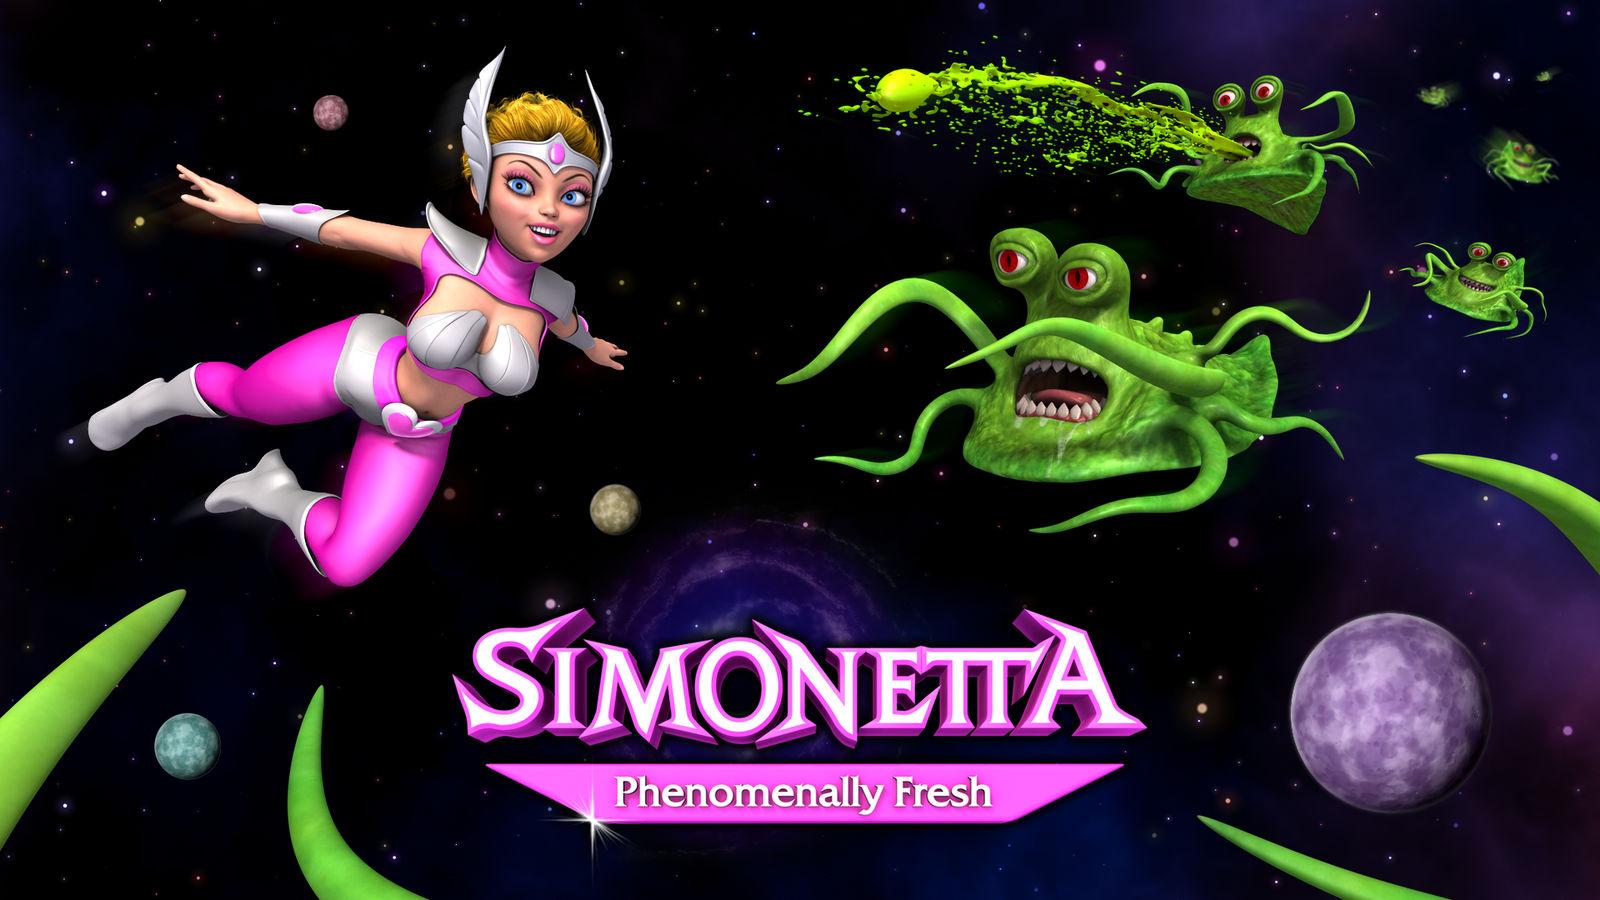 Simonetta Promotional Art